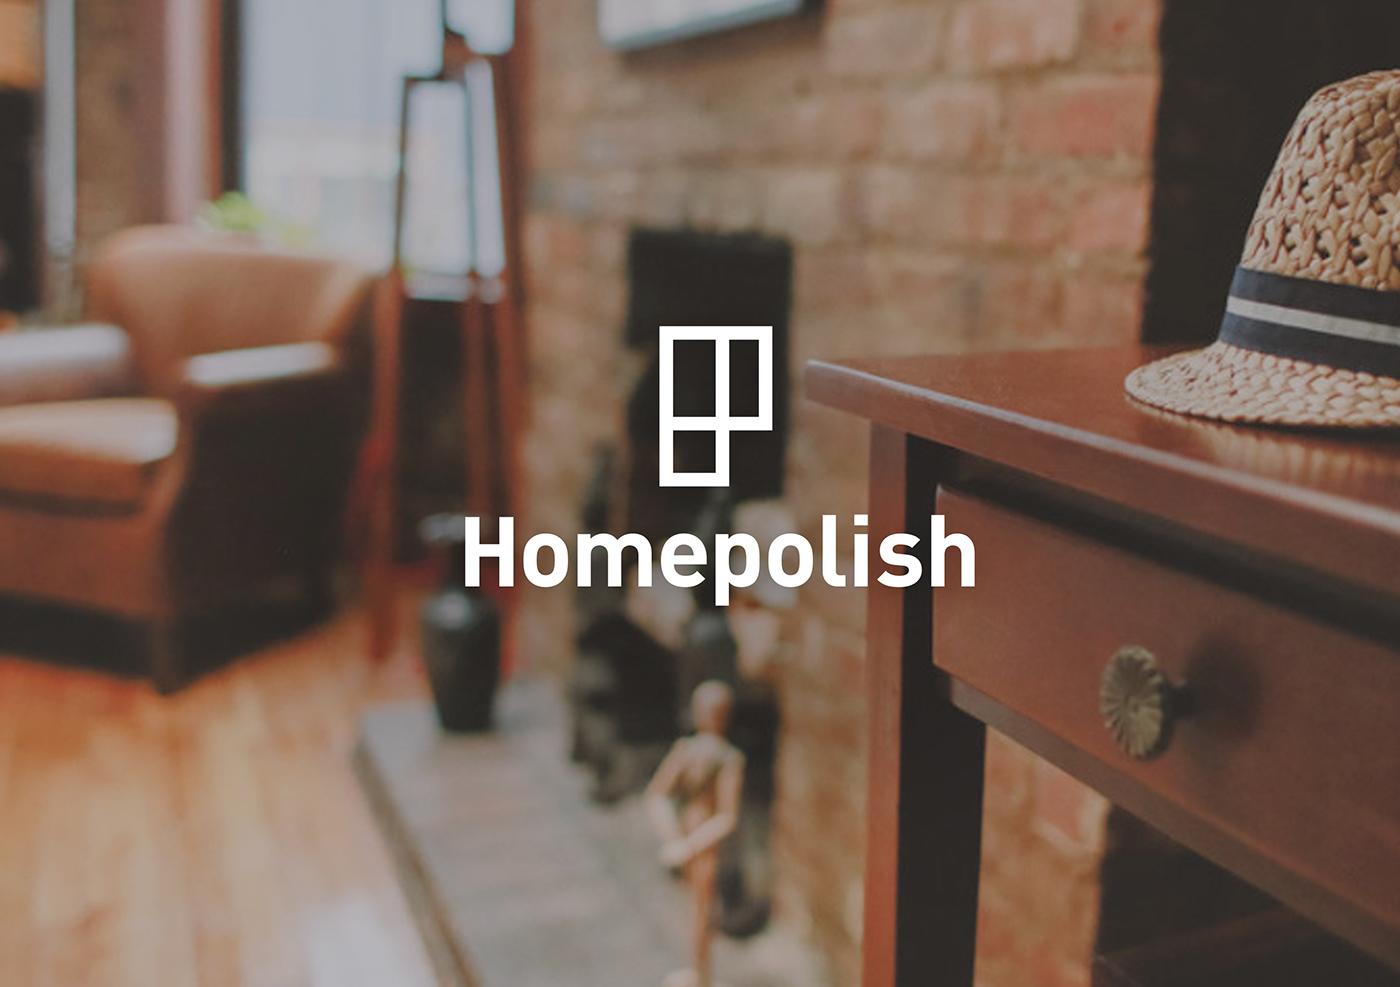 Homepolish Visual Identity On Behance